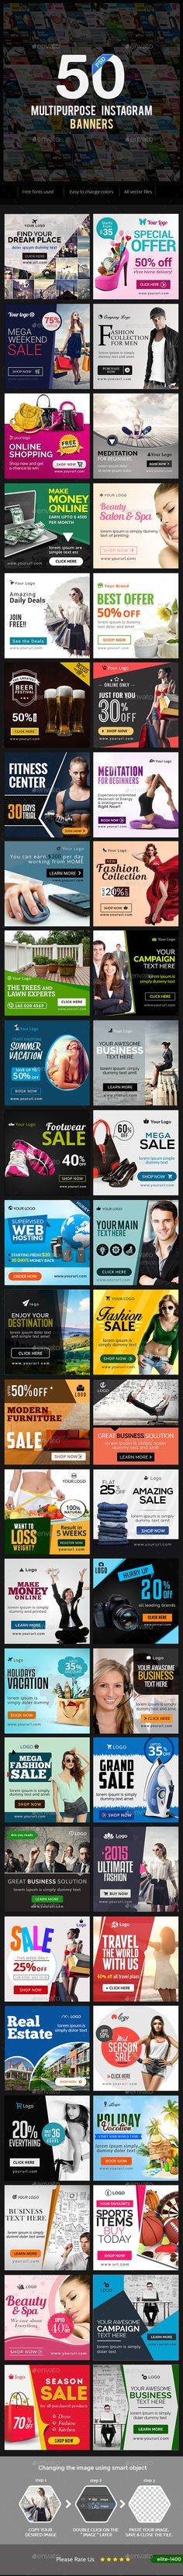 Multipurpose Instagram Banner Templates - 50 Designs - Miscellaneous Social Media